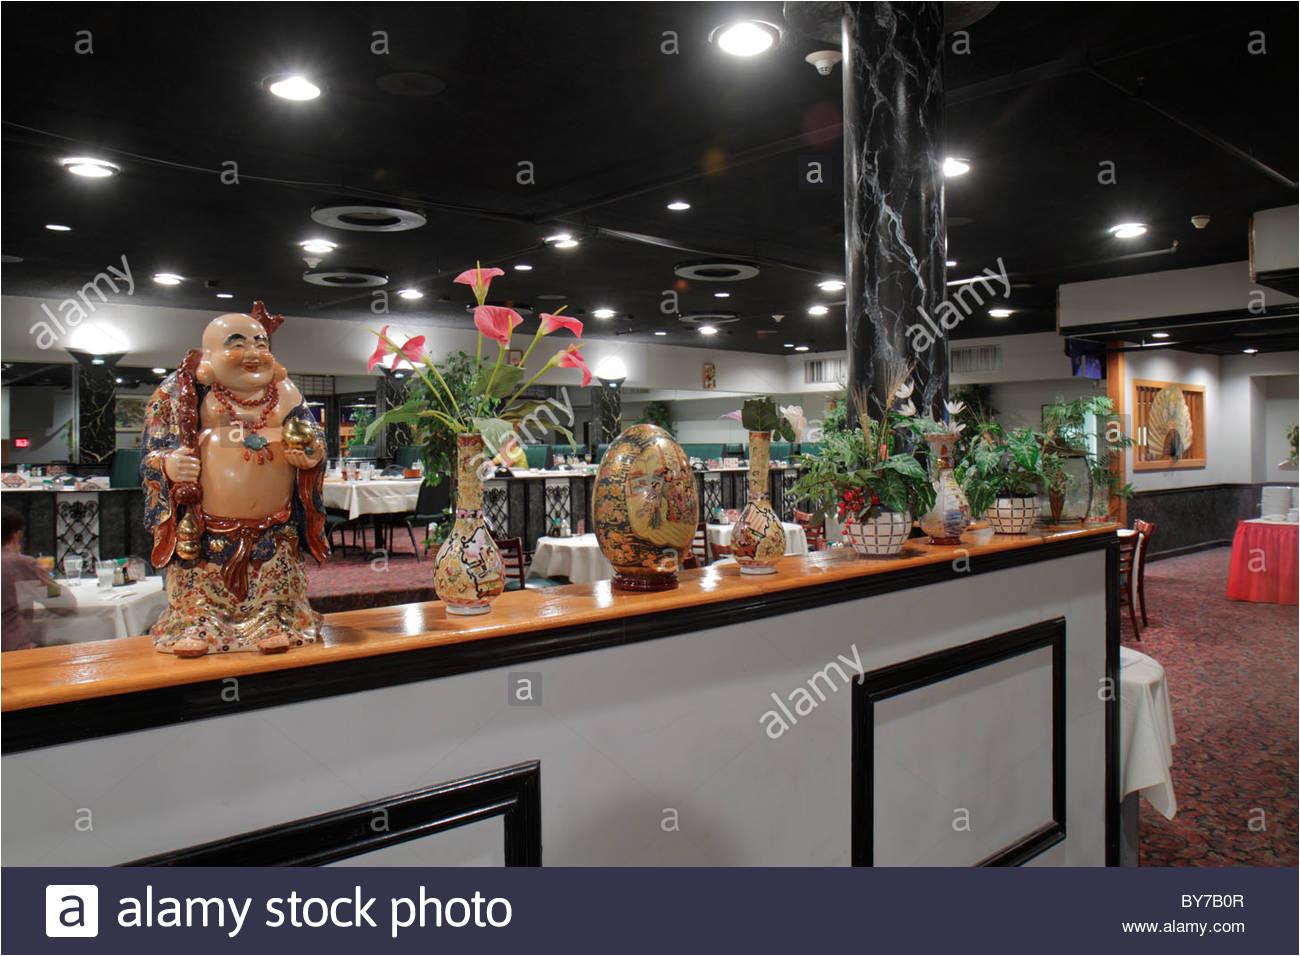 atlanta georgia mandarin house ii chinese restaurant asiatische kuche dekor buddha mann business essen stockbild